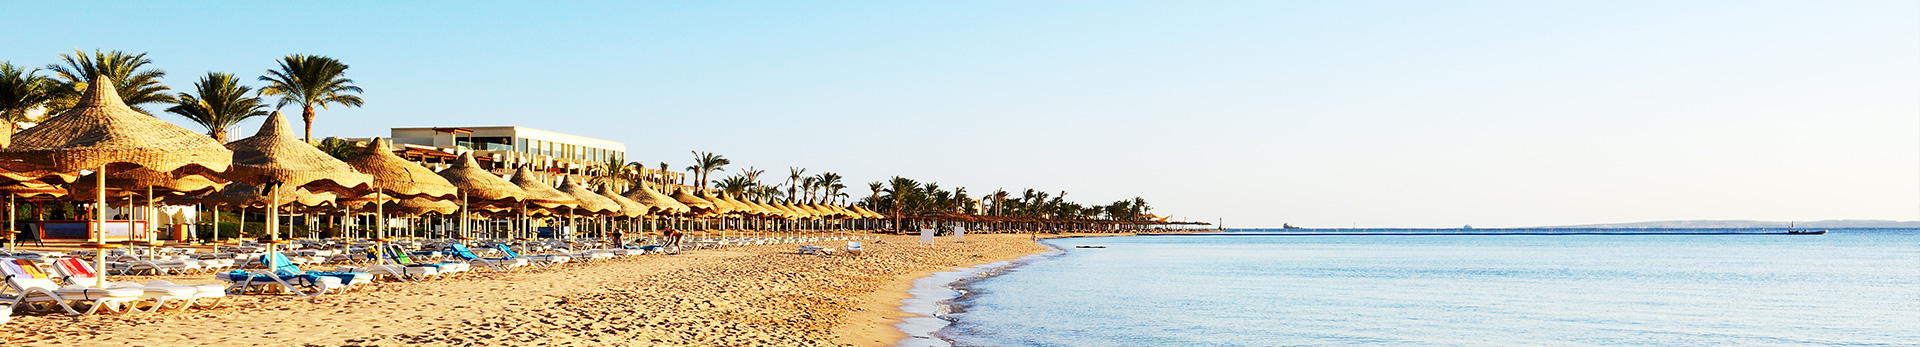 Sharm El Sheikh turu